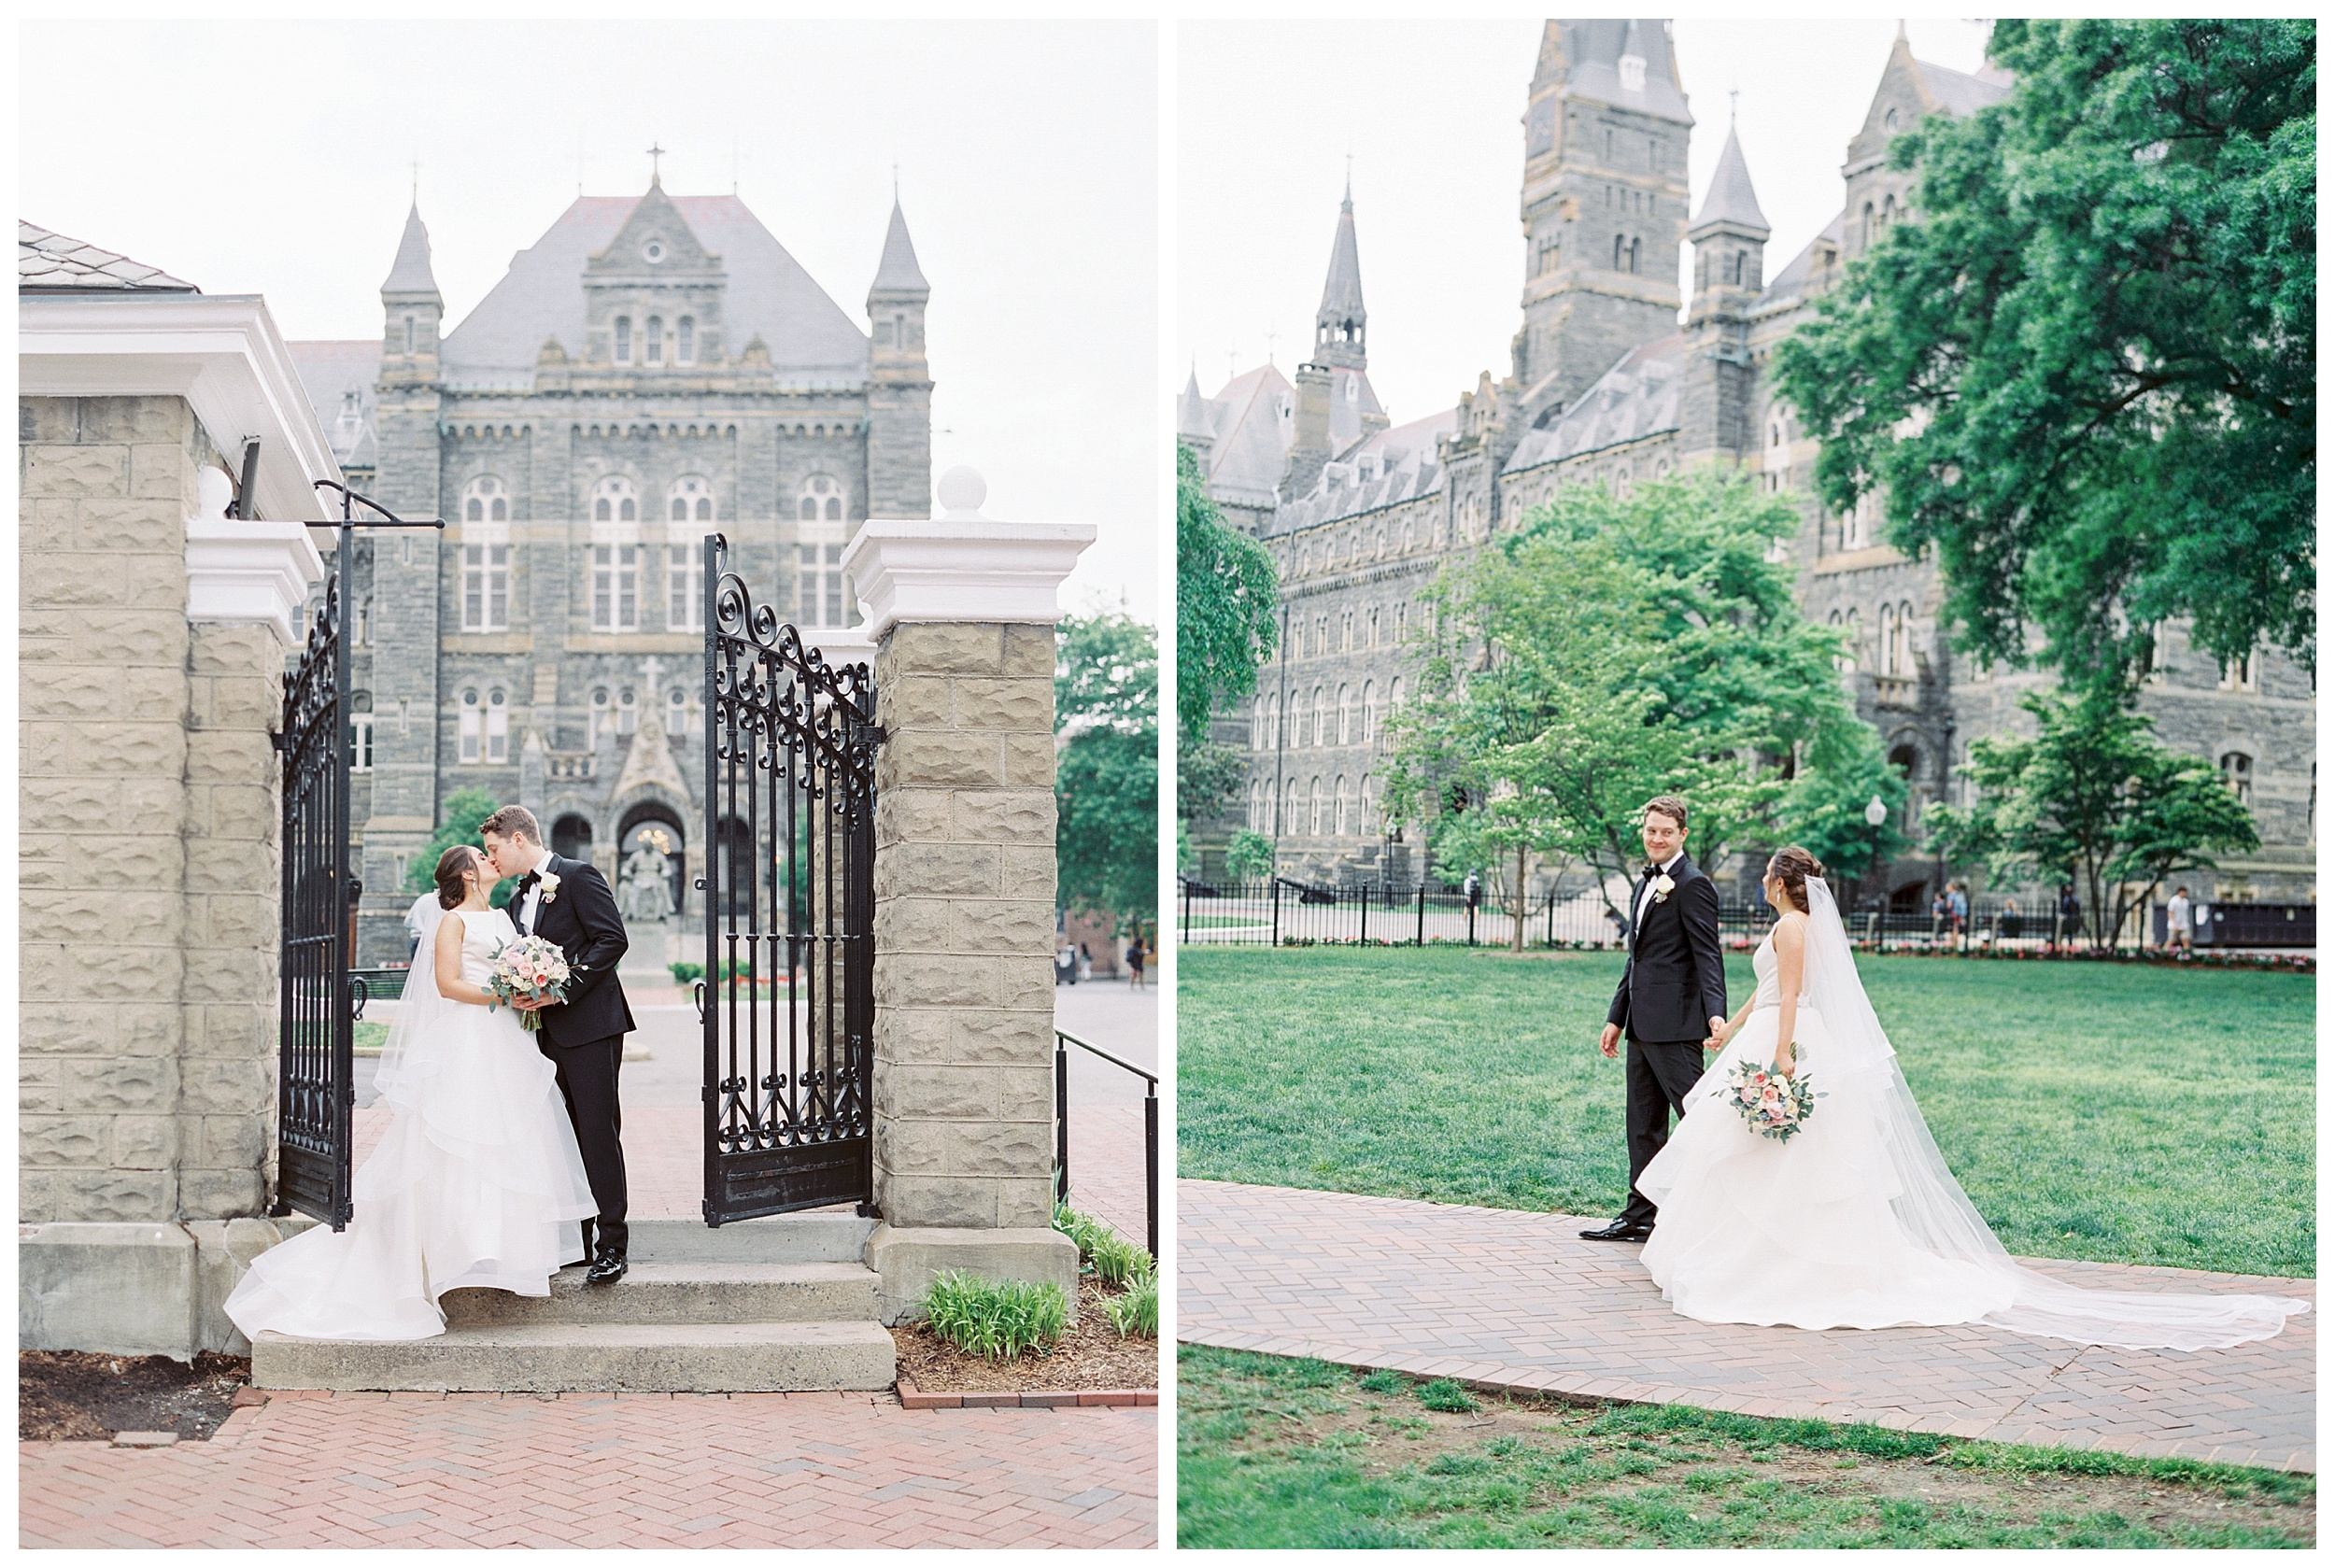 DAR Constitution Hall Wedding Wedding | Daughters of the American Revolution Wedding | District of Columbia Film Wedding Photographer Kir Tuben_0069.jpg